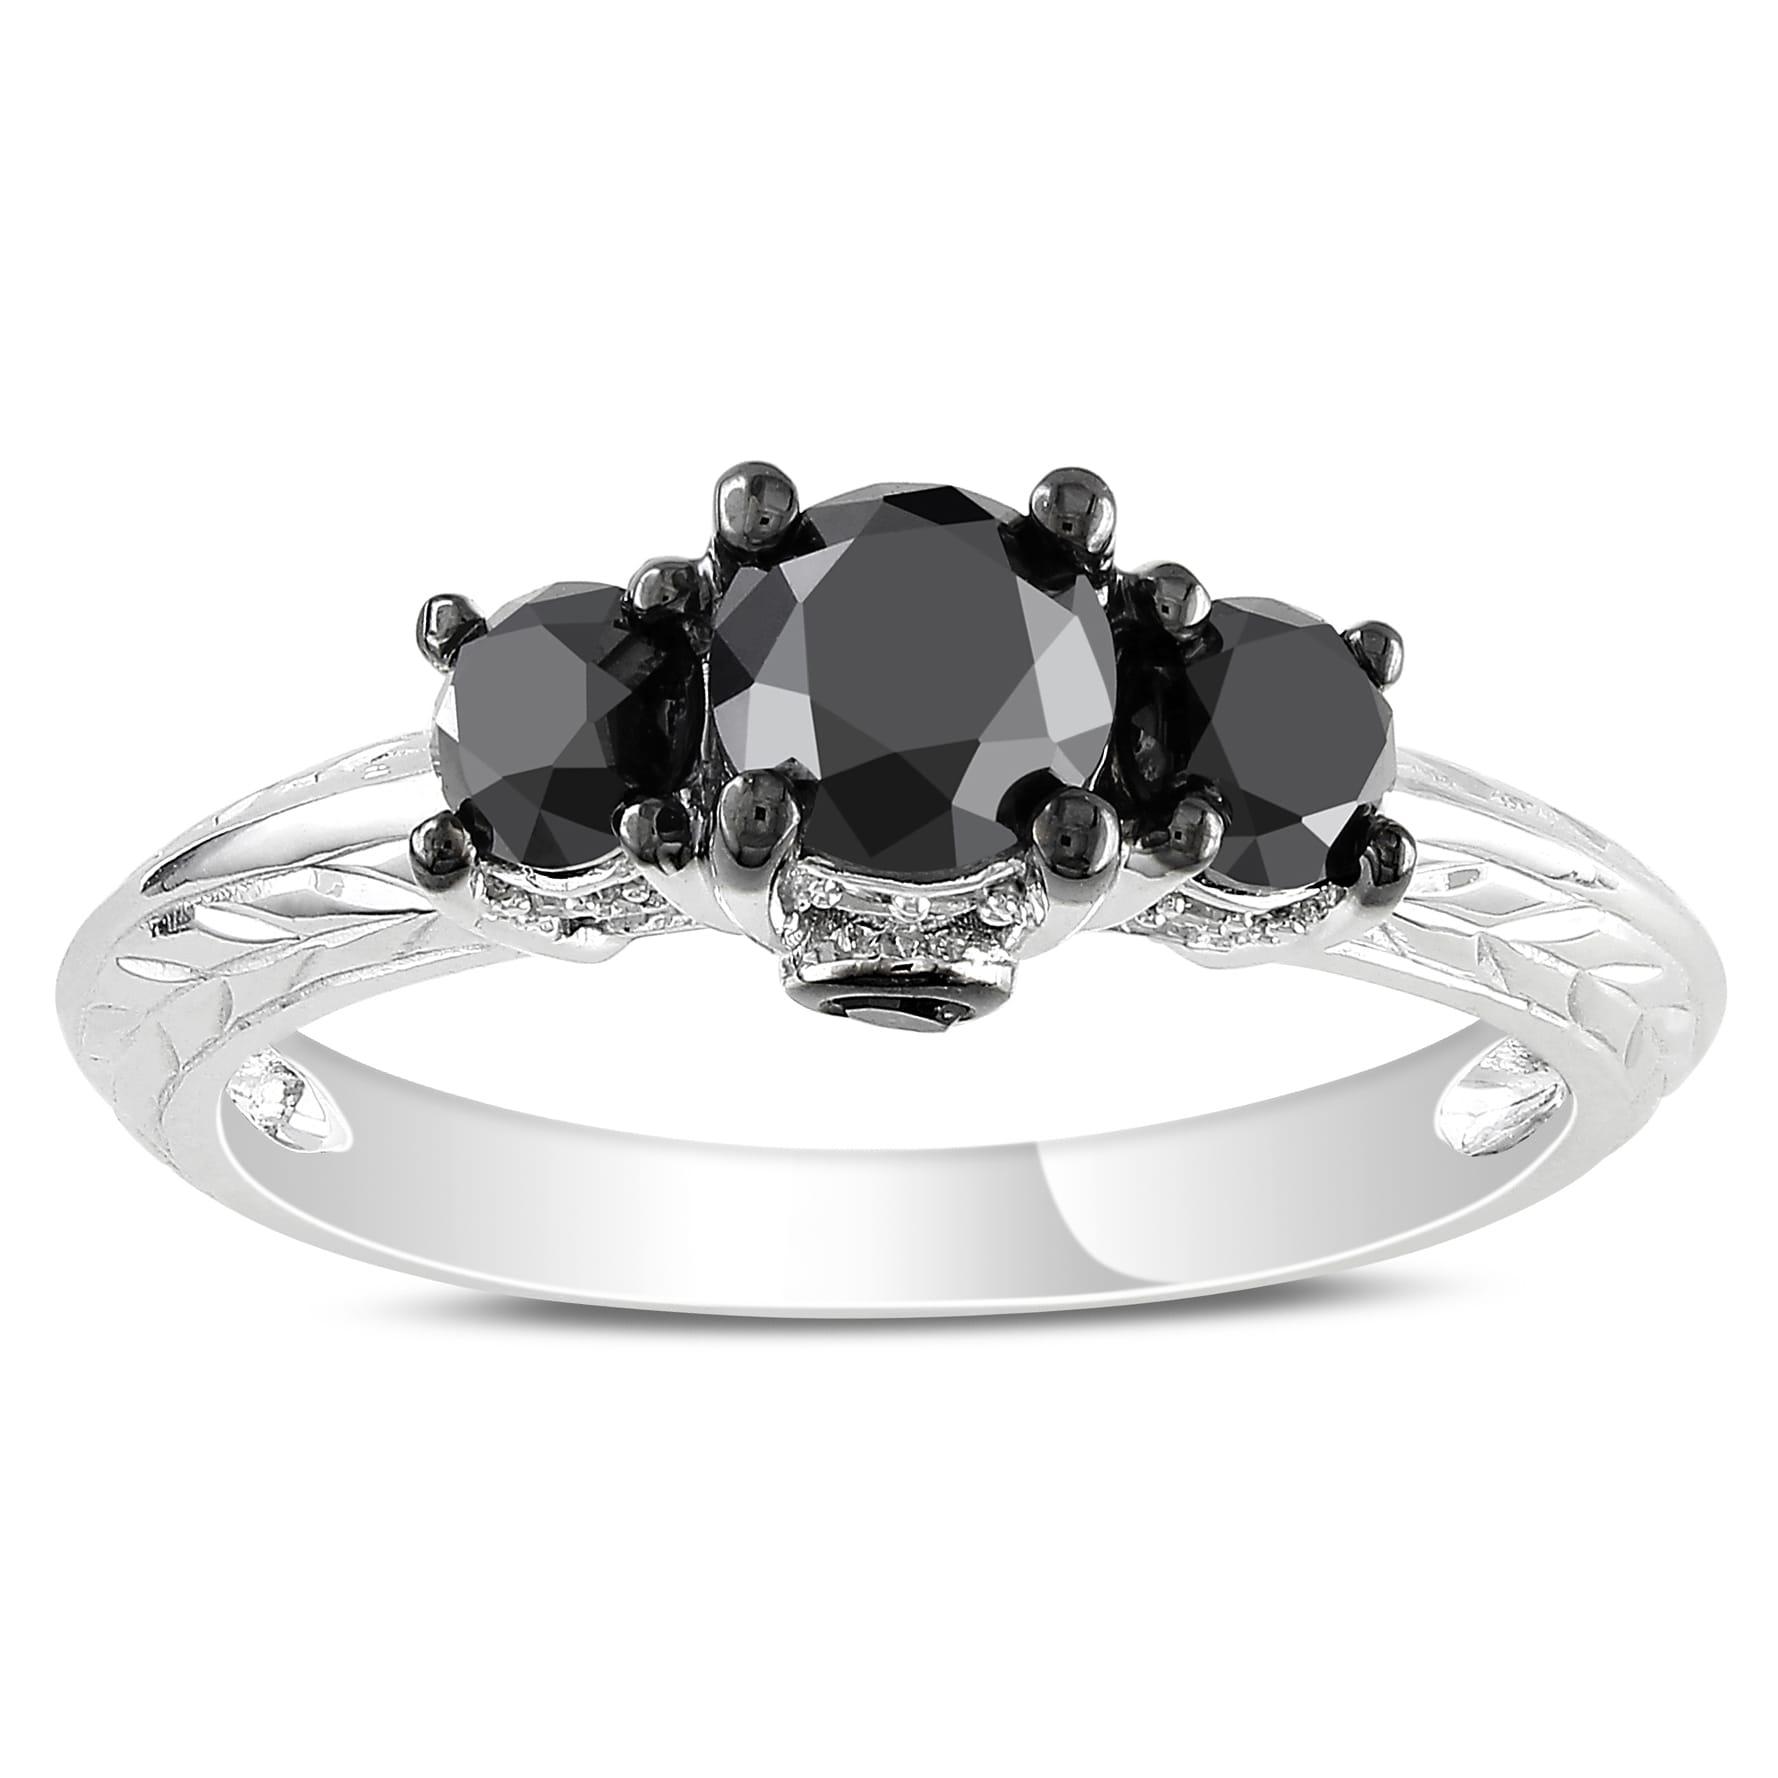 Miadora 14k Gold 1 1/2ct TDW Black and White Diamond 3-Stone Plus Classic Engagement Ring (G-H, I1-I2)